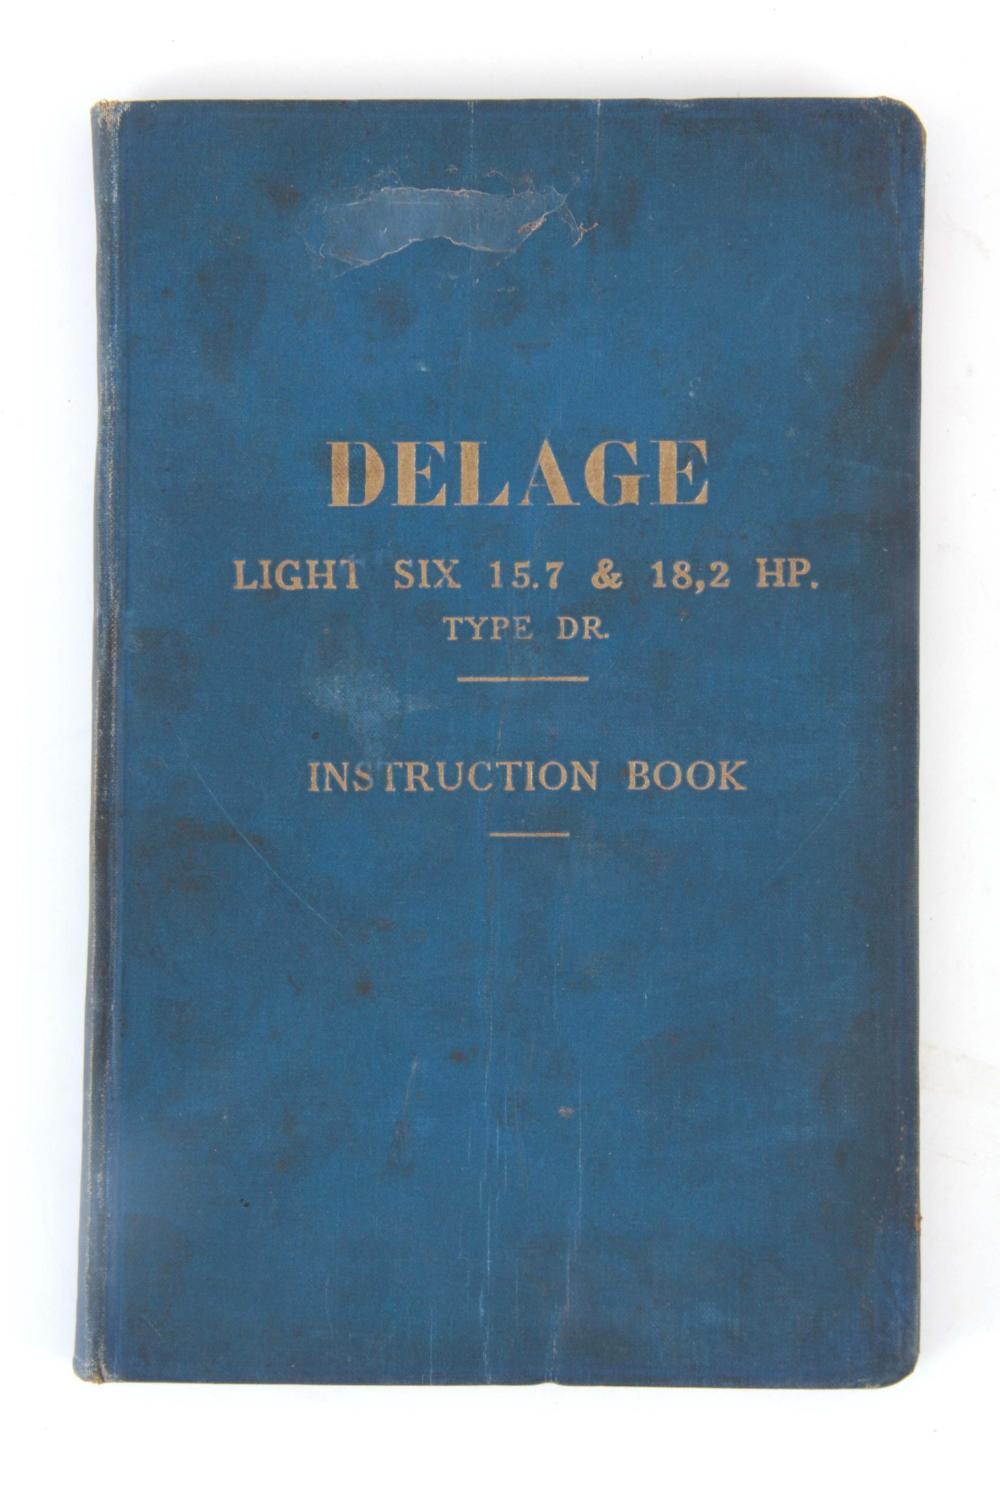 A RARE INSTRUCTION BOOK, DELAGE LIGHT SIX 15.7 & 1